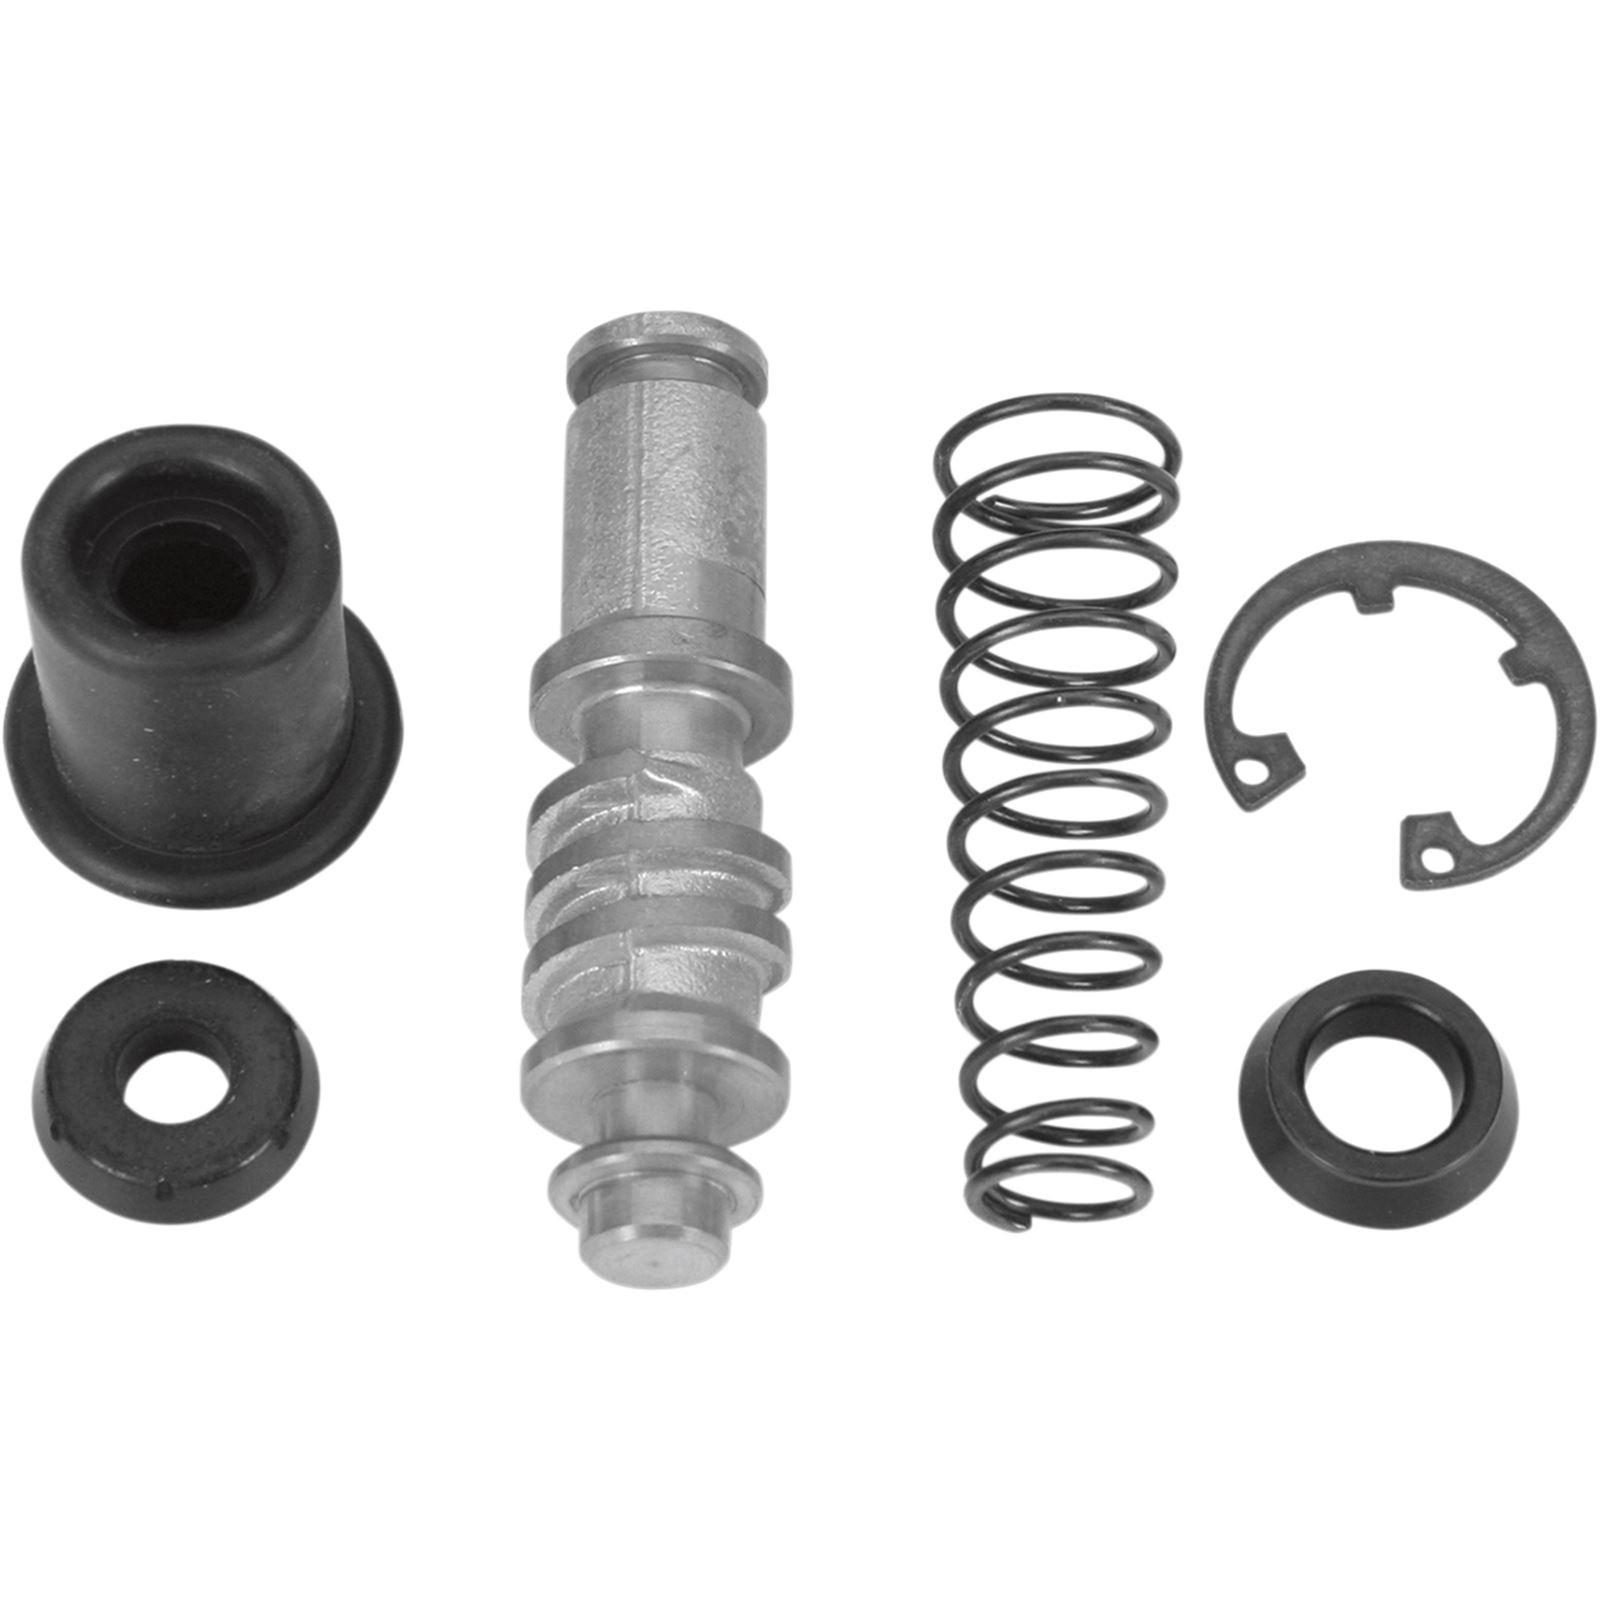 Moose Front Master Cylinder Repair Kit for TRX250